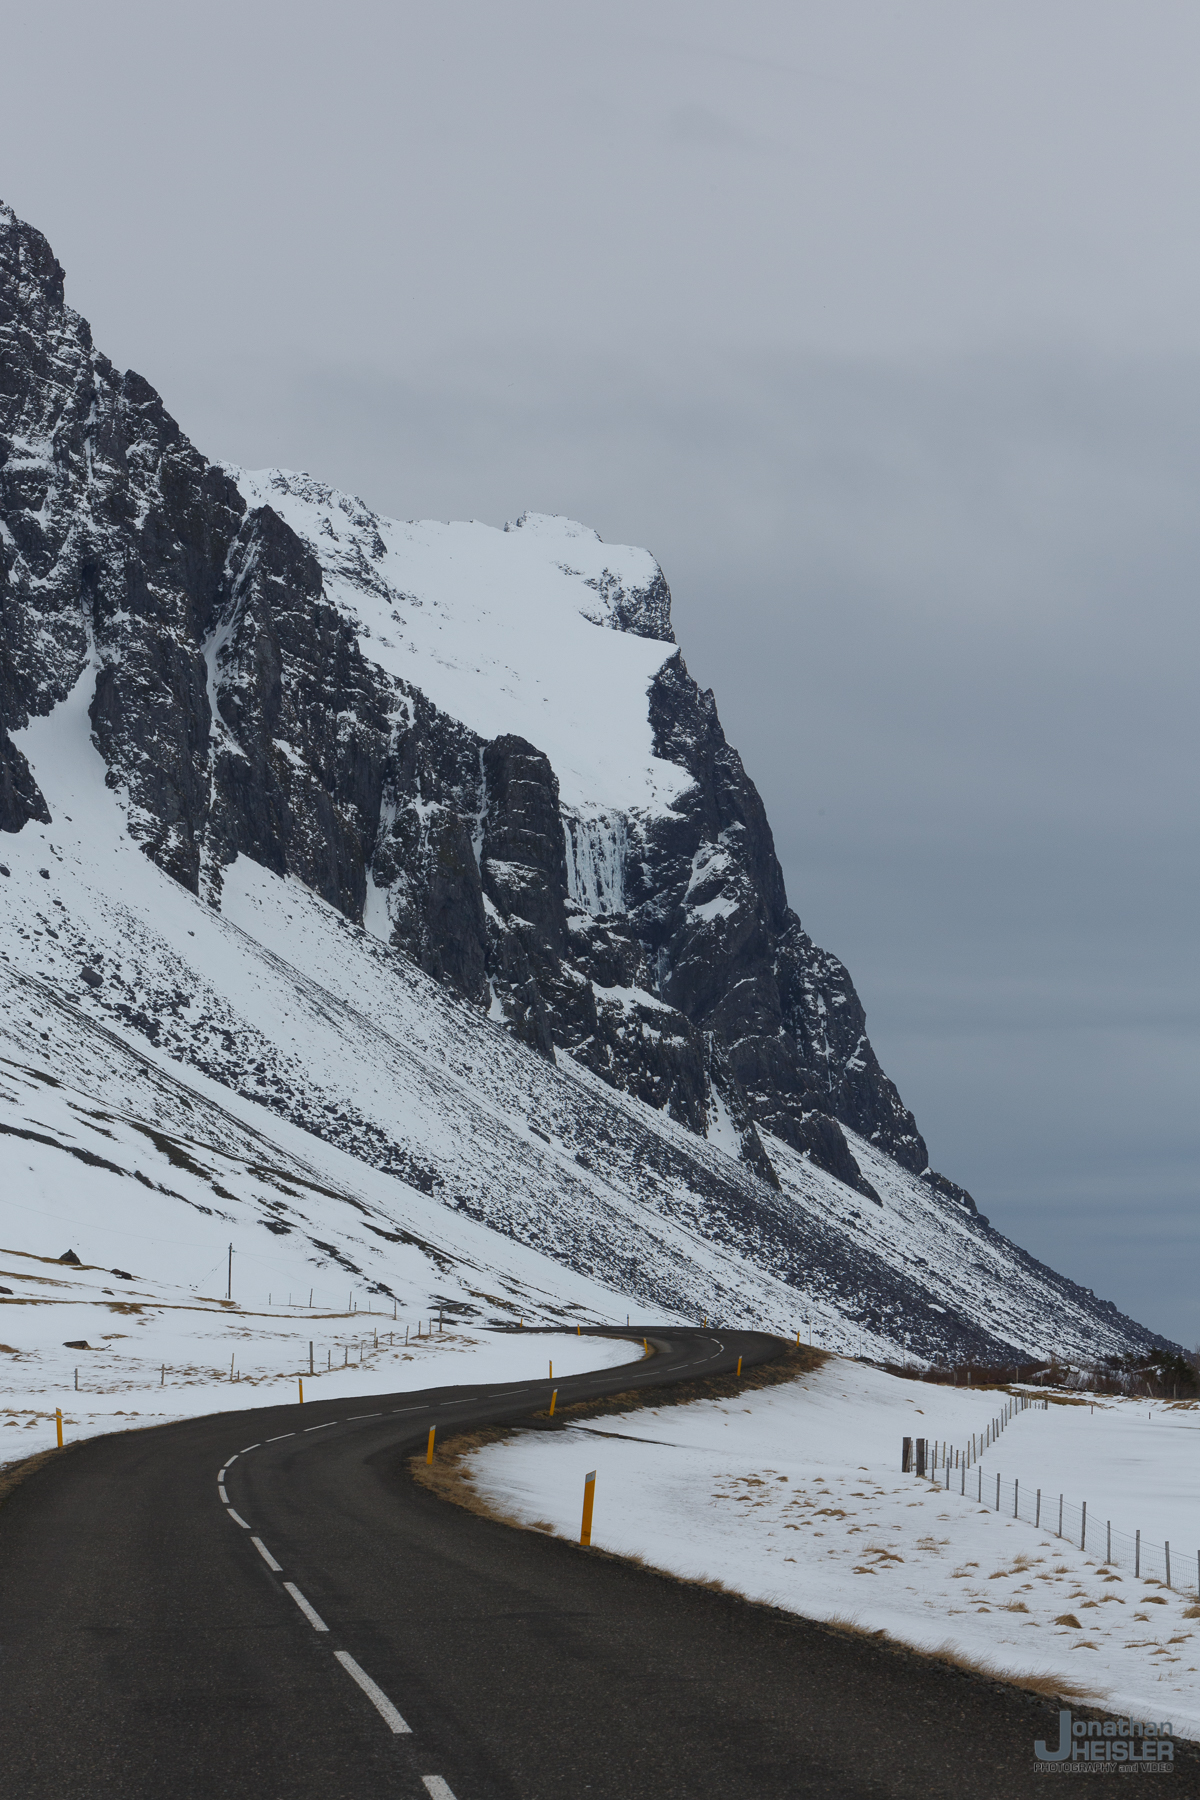 Iceland Winter Photos_  Jonathan Heisler __  02292016 _ 029.jpg